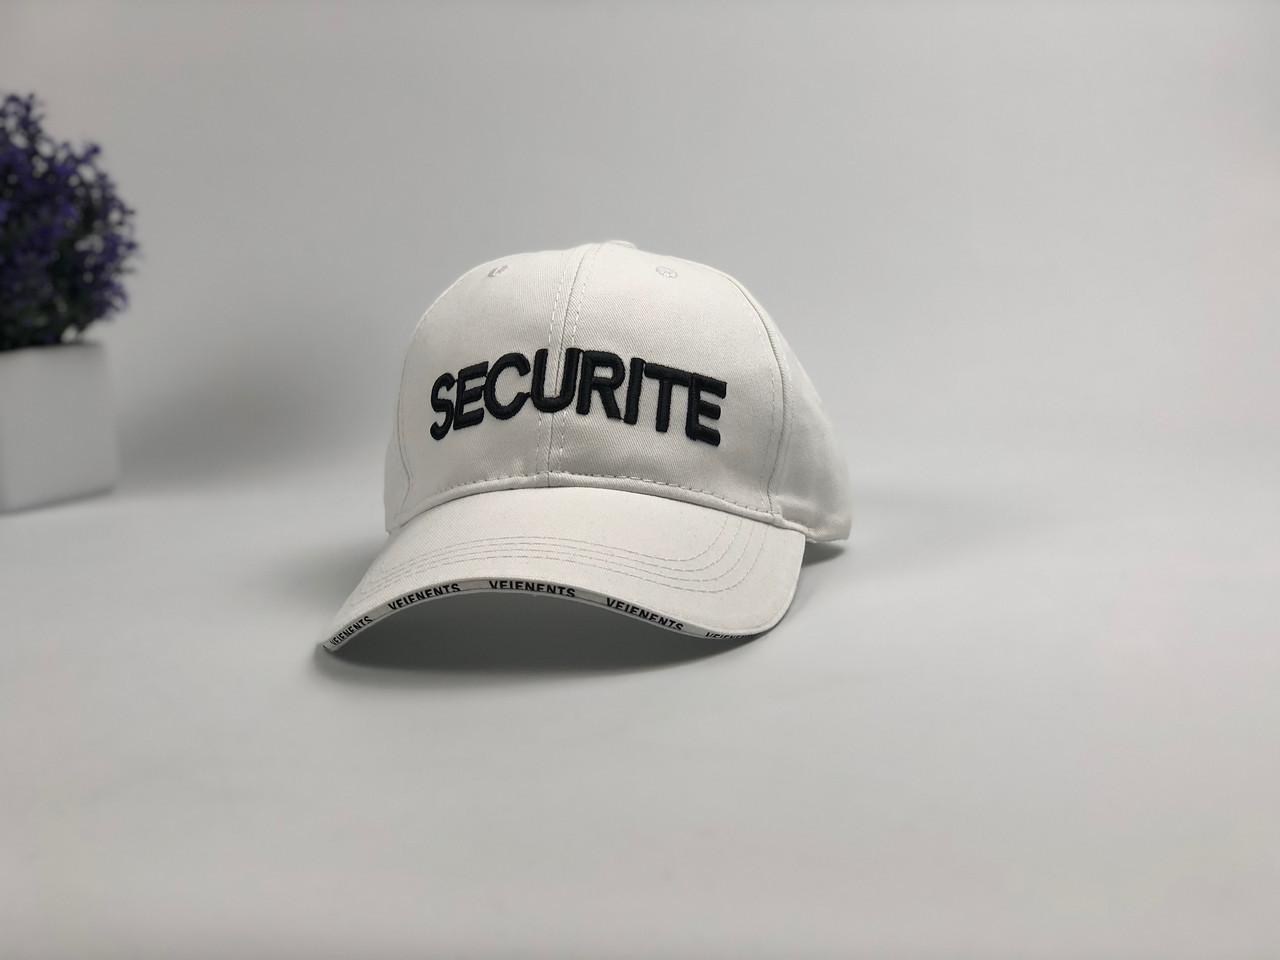 Кепка бейсболка Security (біла)